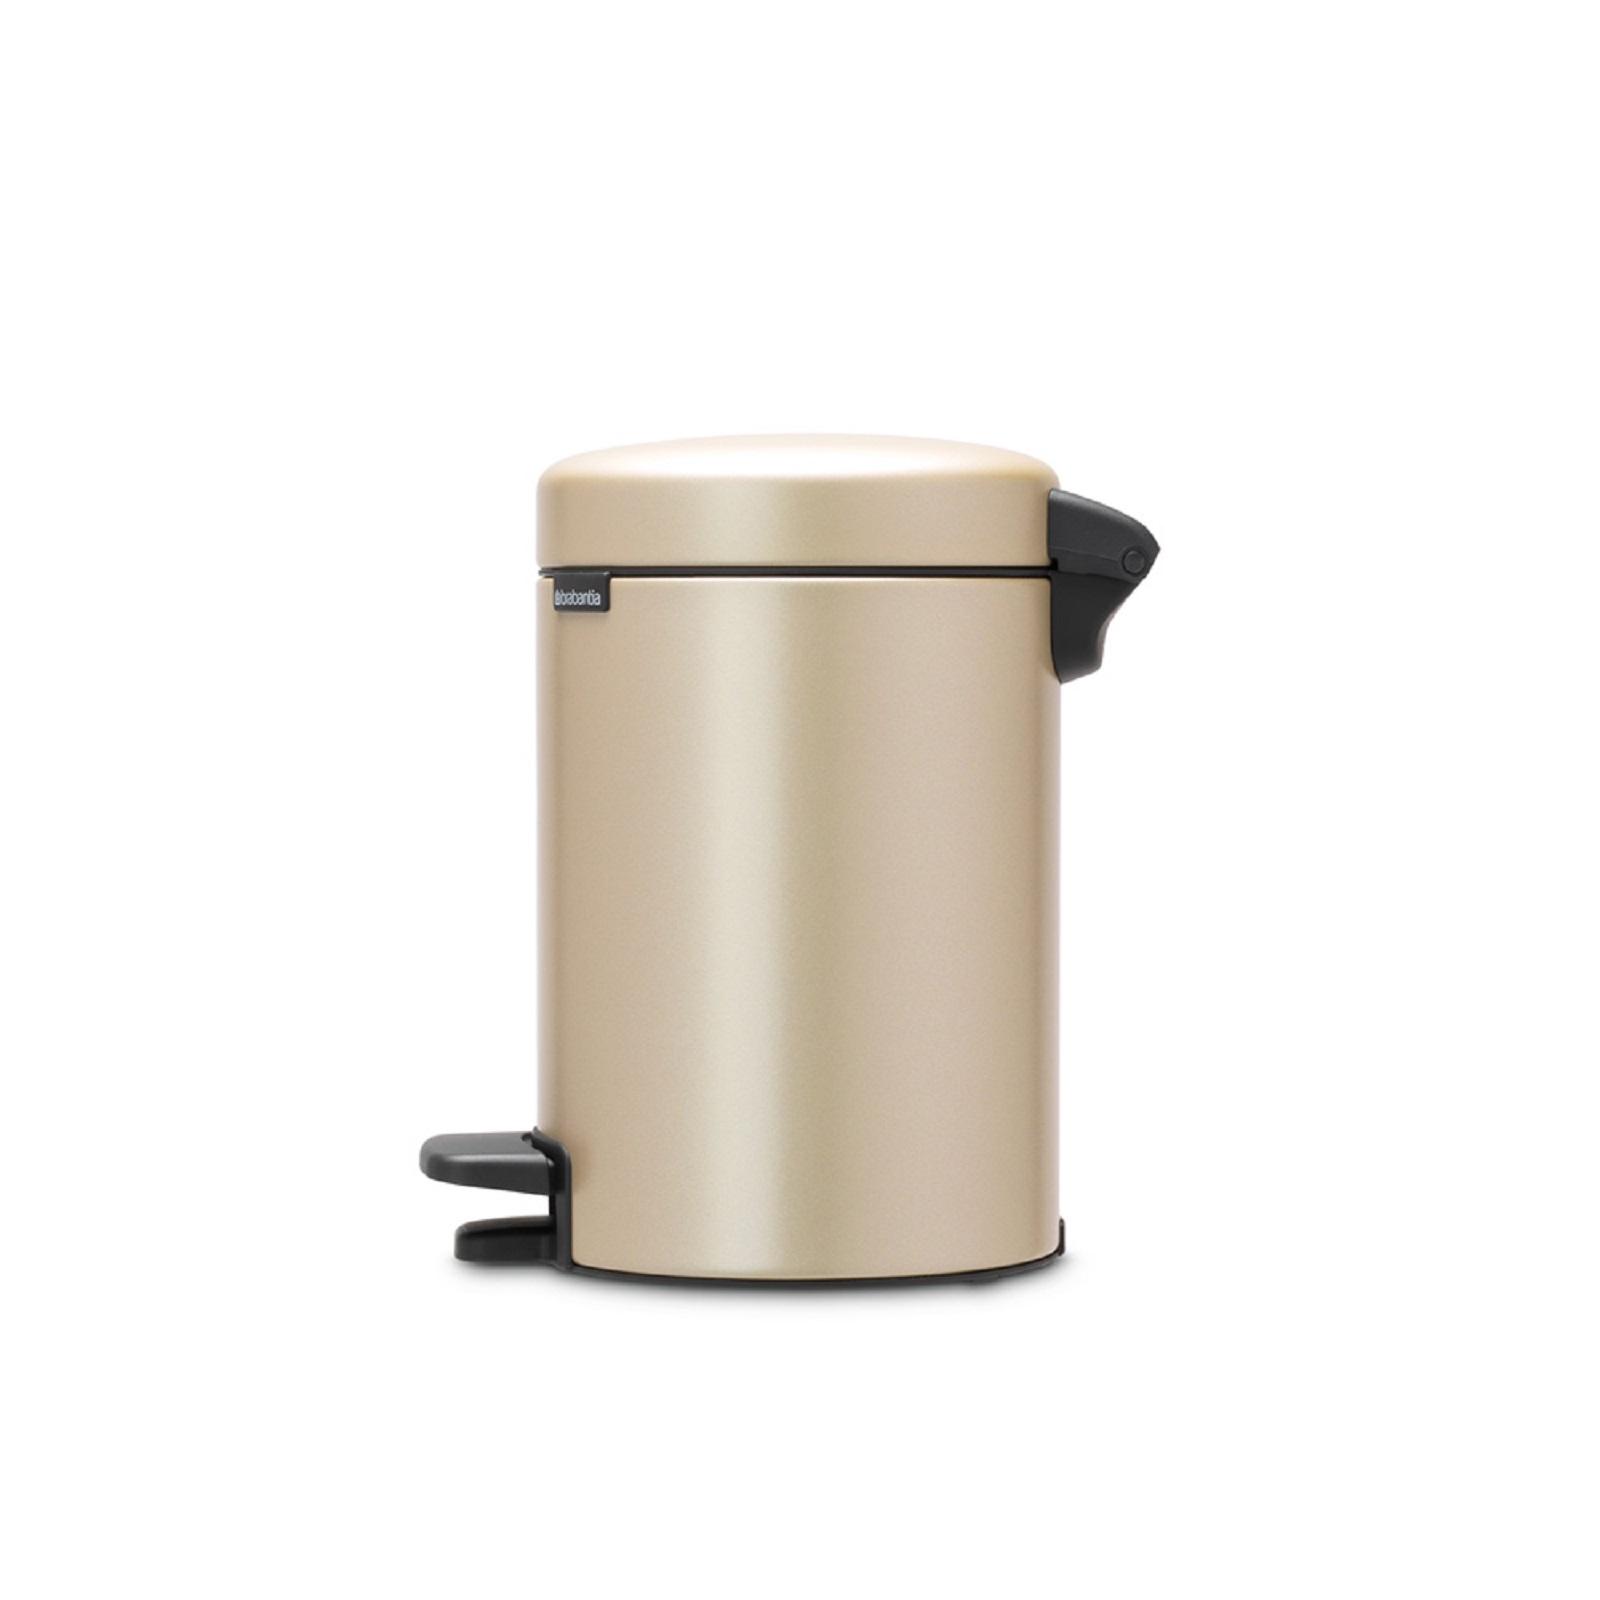 Бак для мусора Pedal Bin NewIcon Brabantia, объем 3 л, шампань бежевый Brabantia 304408 фото 6